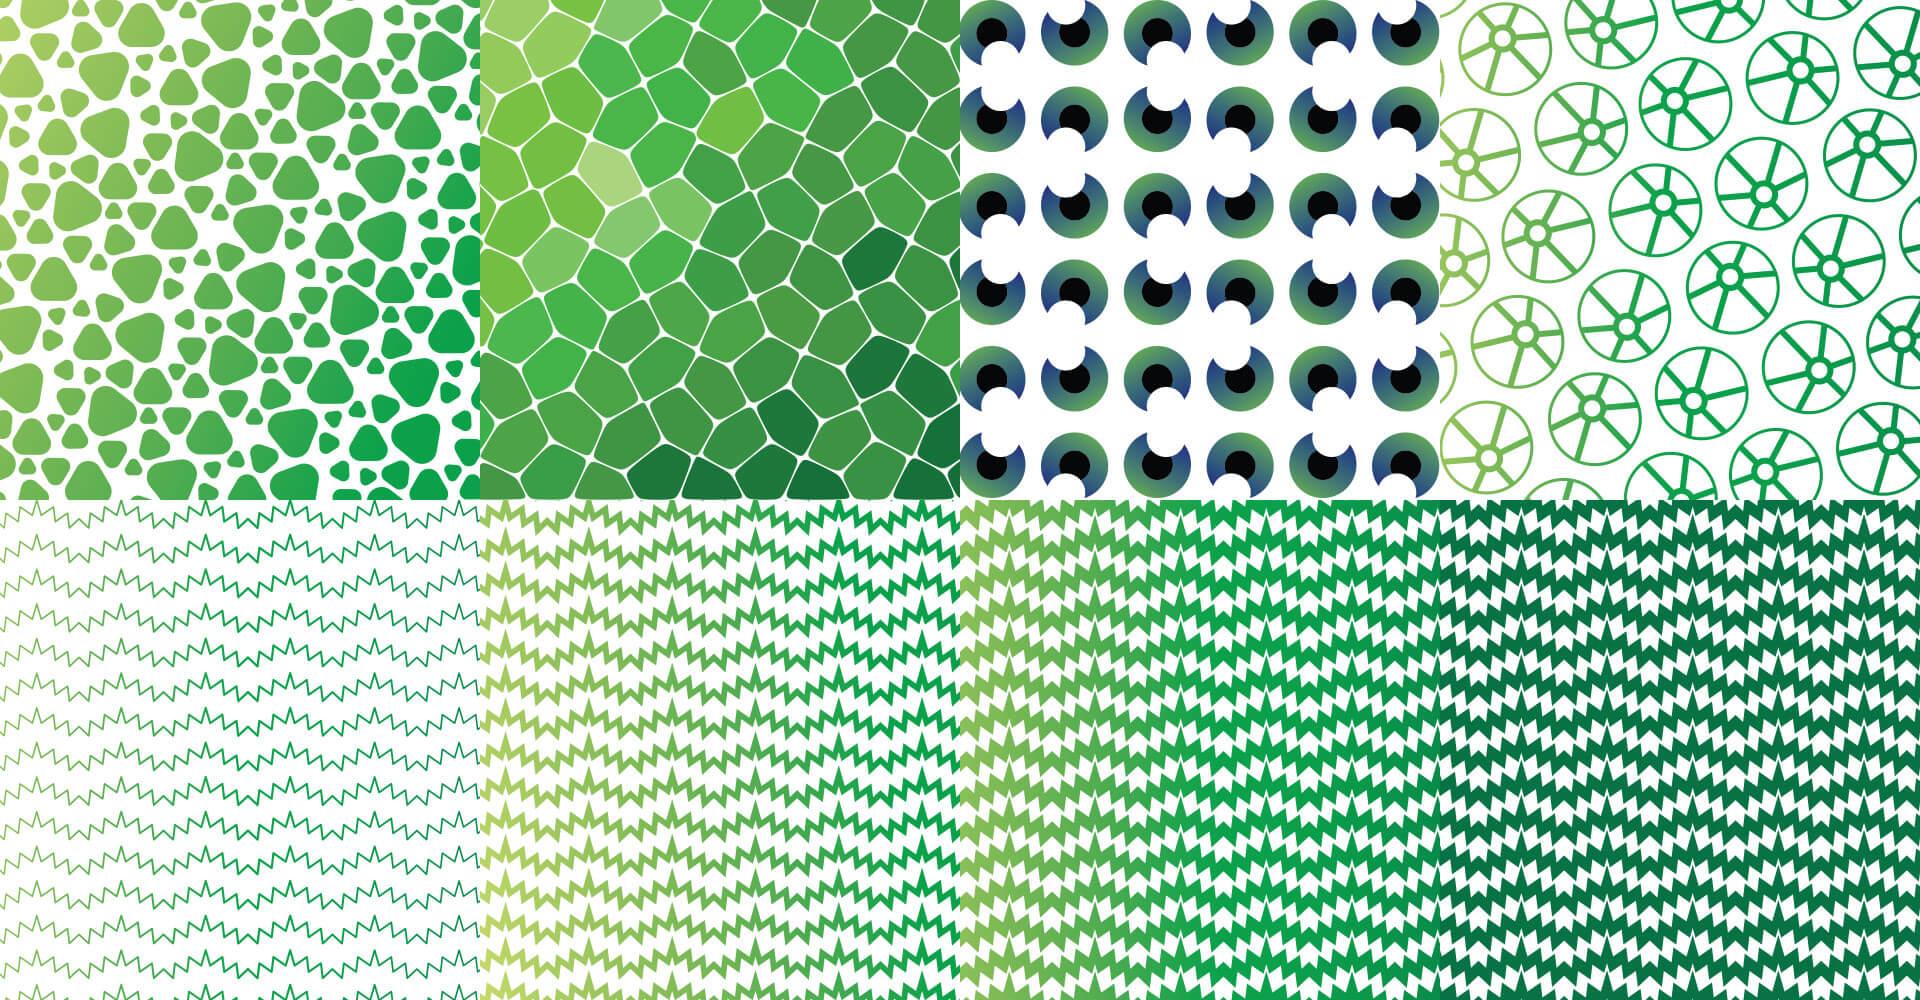 05 camarisol patterns